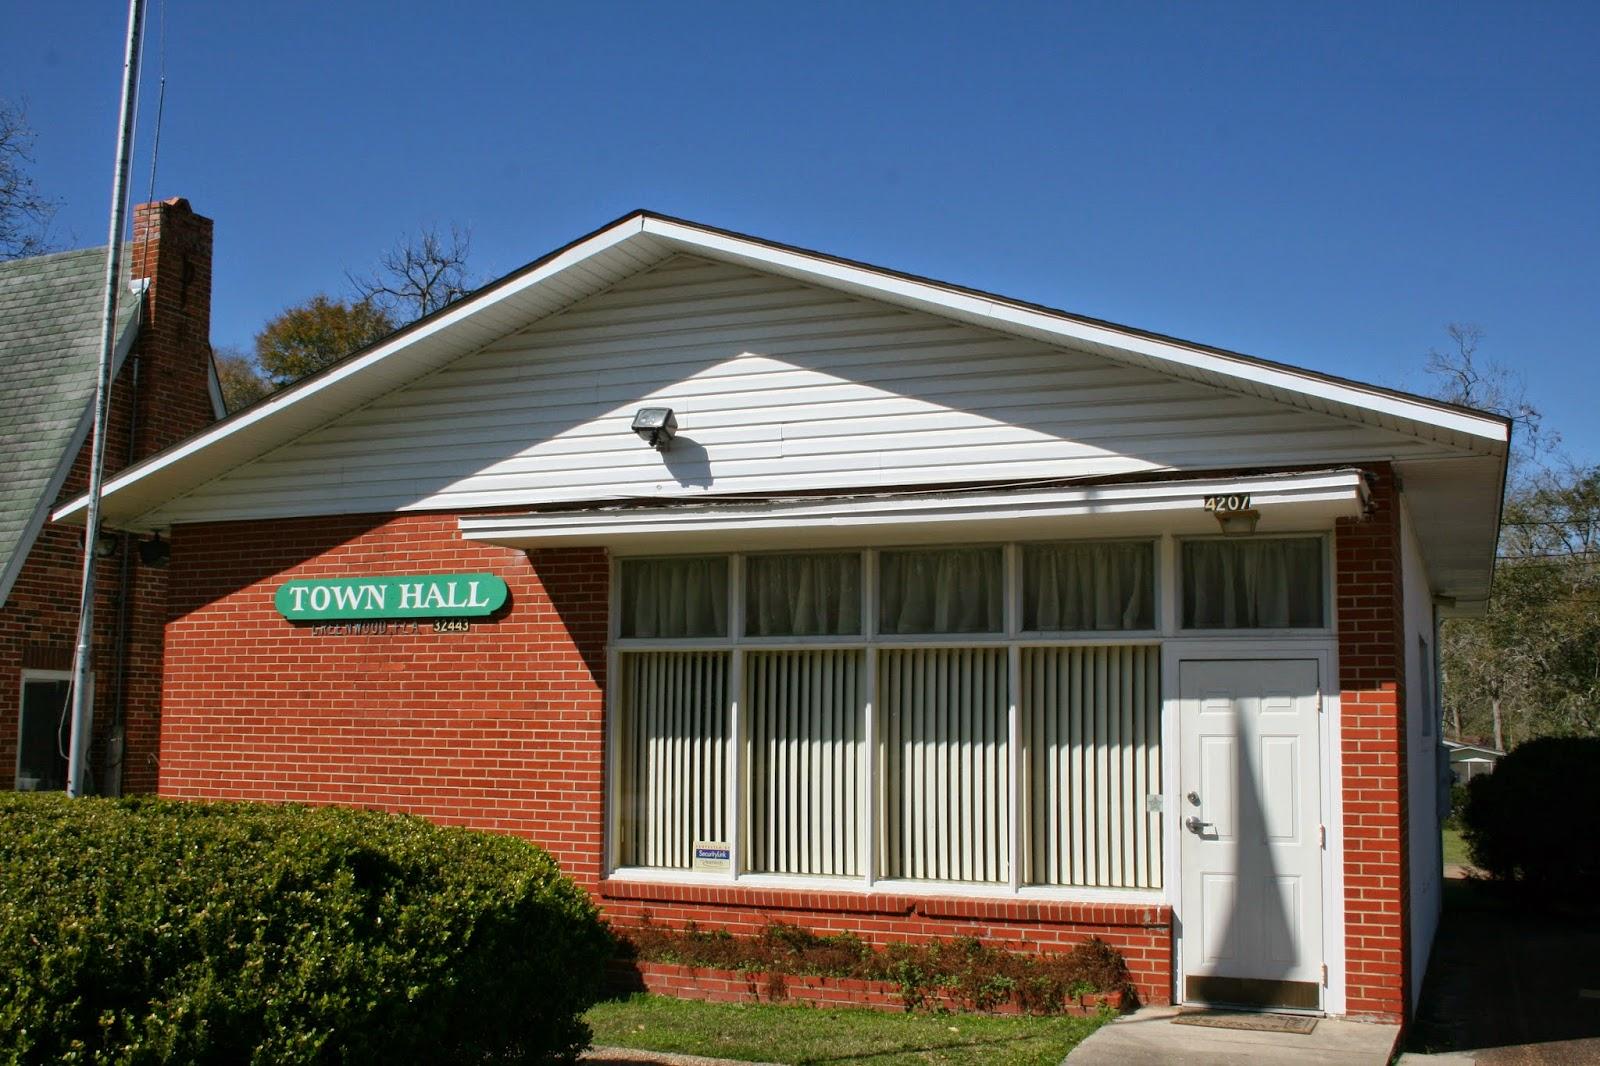 jackson county florida 2015 greenwood town hall in greenwood florida